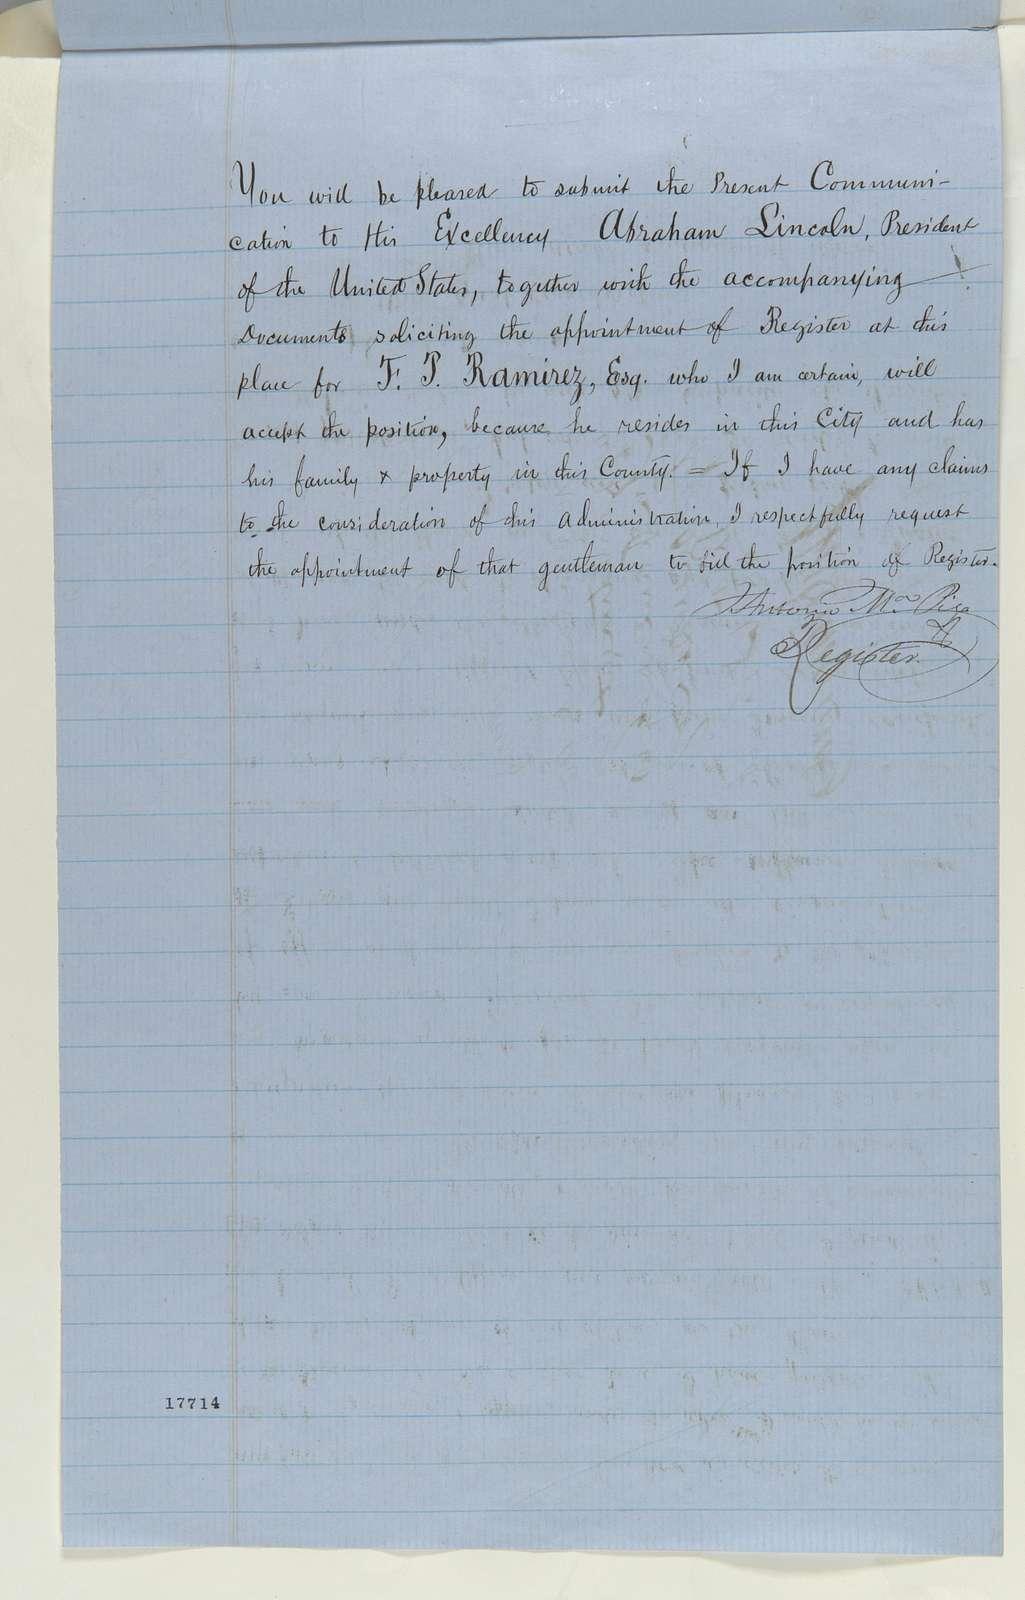 Abraham Lincoln papers: Series 1. General Correspondence. 1833-1916: Antonio Maria Pico to Caleb B. Smith, Saturday, August 16, 1862 (Resignation; endorsed by Caleb Smith)